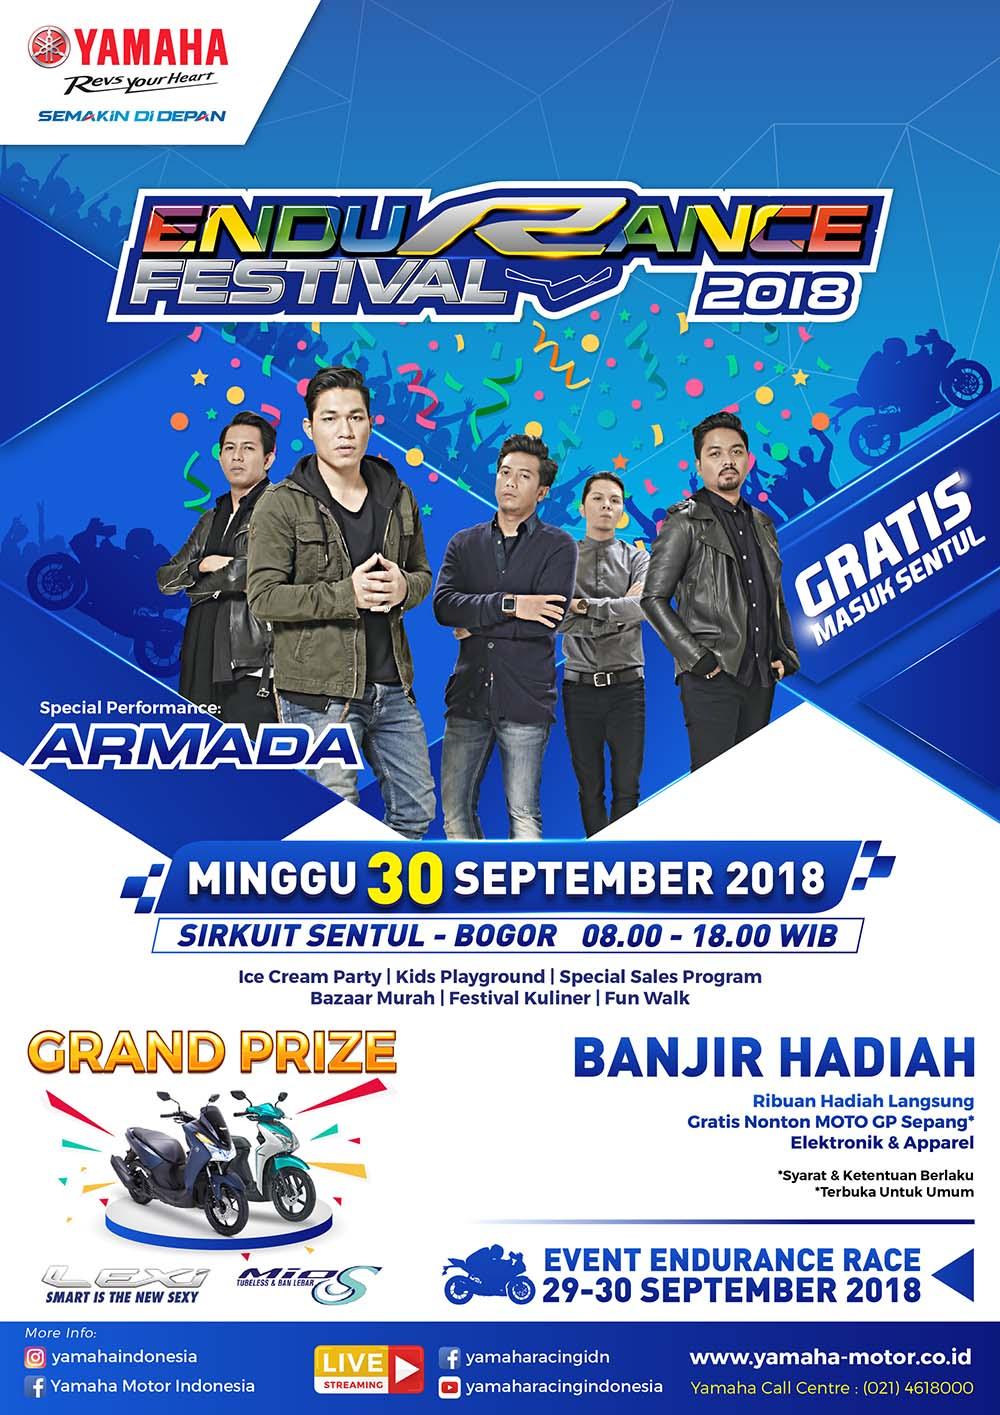 Yamaha Endurance Festival 2018 bersama Armada